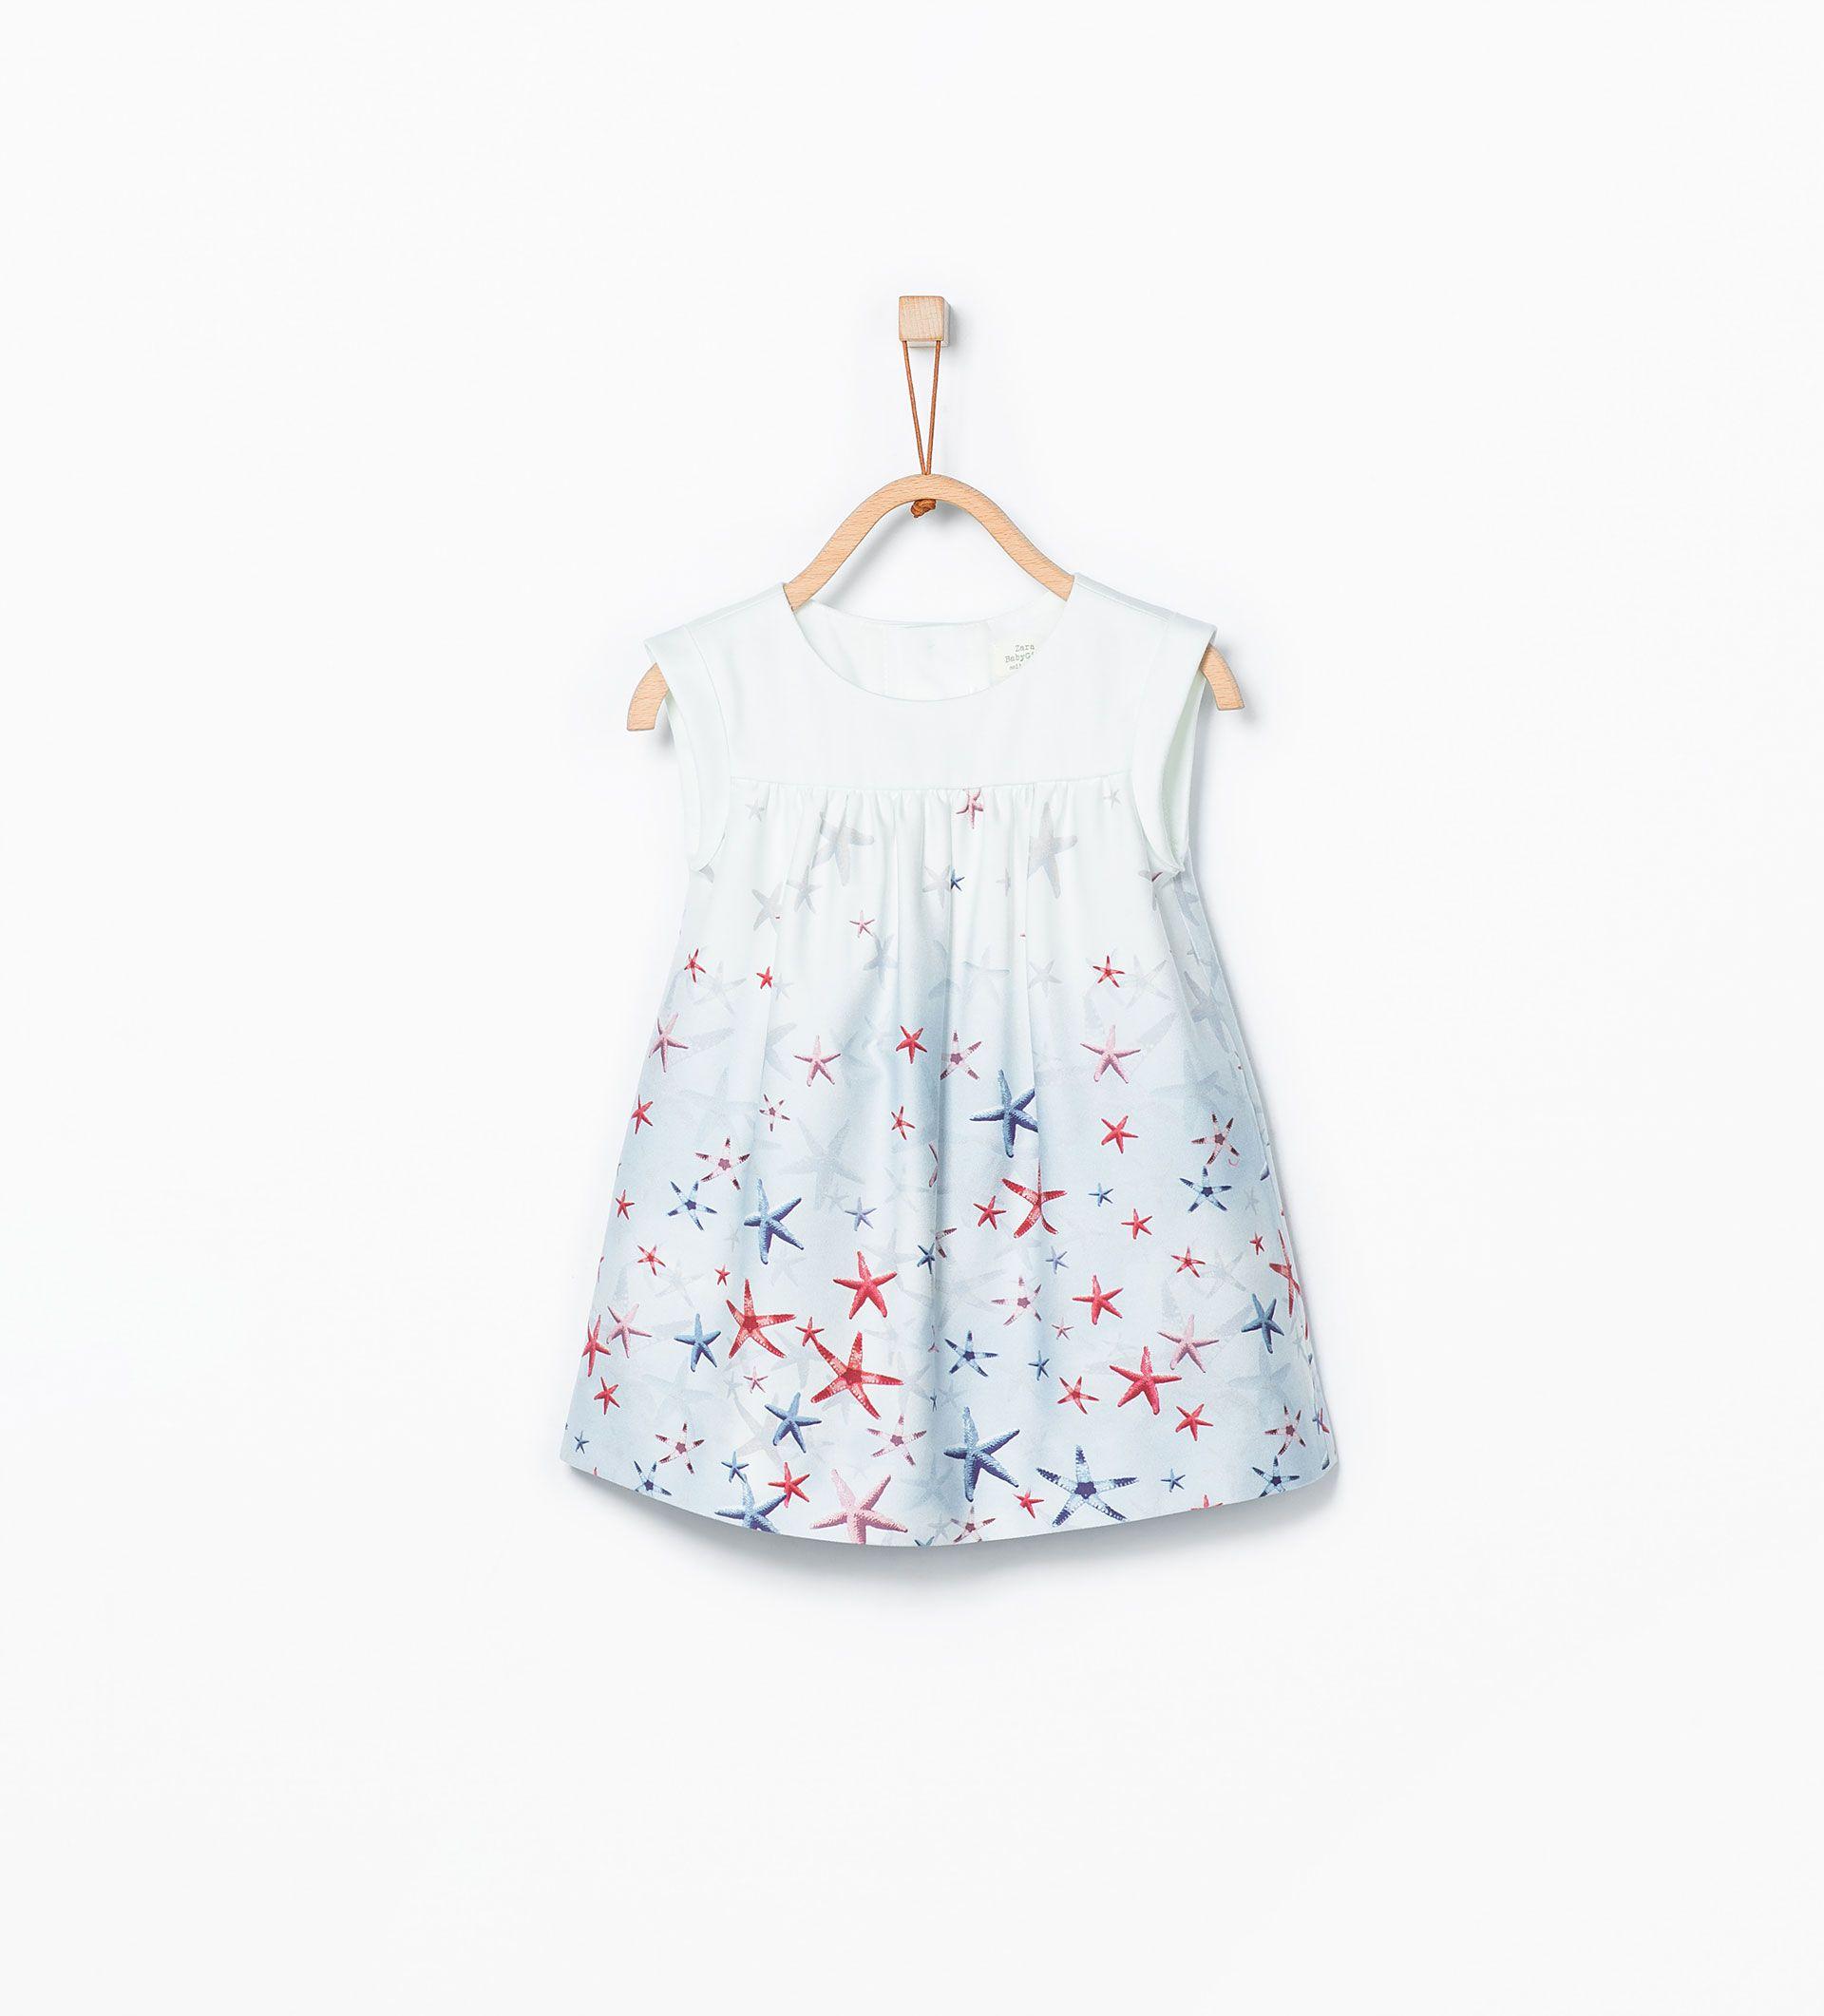 e3e3e013afc Φόρεμα με στάμπα βυθό θάλασσας - ΦΟΡΕΜΑΤΑ - ΒΡΕΦΙΚΑ ΚΟΡΙΤΣΙ (3 ΜΗΝΩΝ - 3  ΕΤΩΝ) - ΠΑΙΔΙΚΑ   ZARA ΕΛΛΑΔΑ